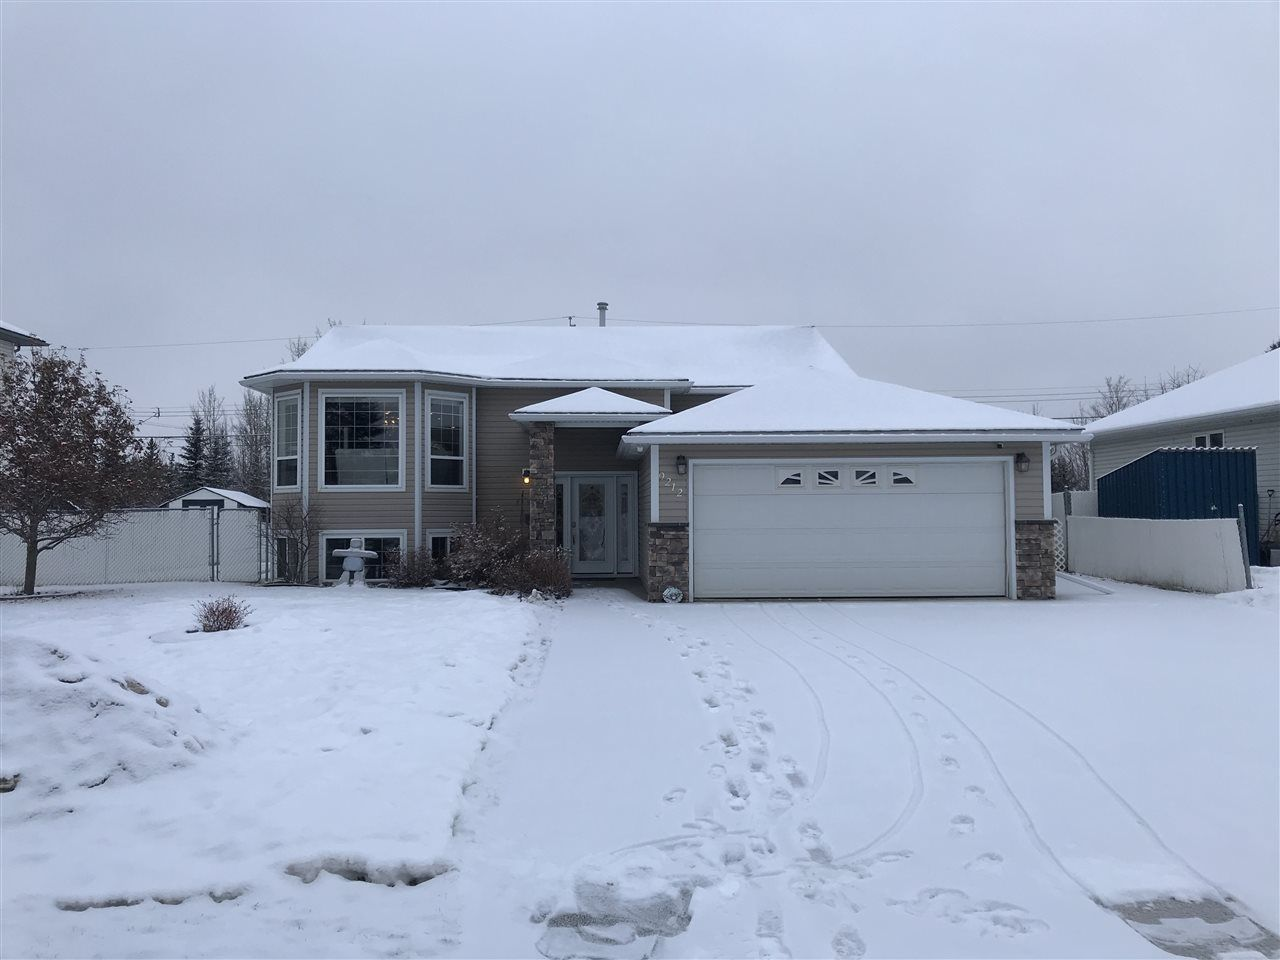 Main Photo: 9212 116 AVENUE in : Fort St. John - City NE House for sale : MLS®# R2526415